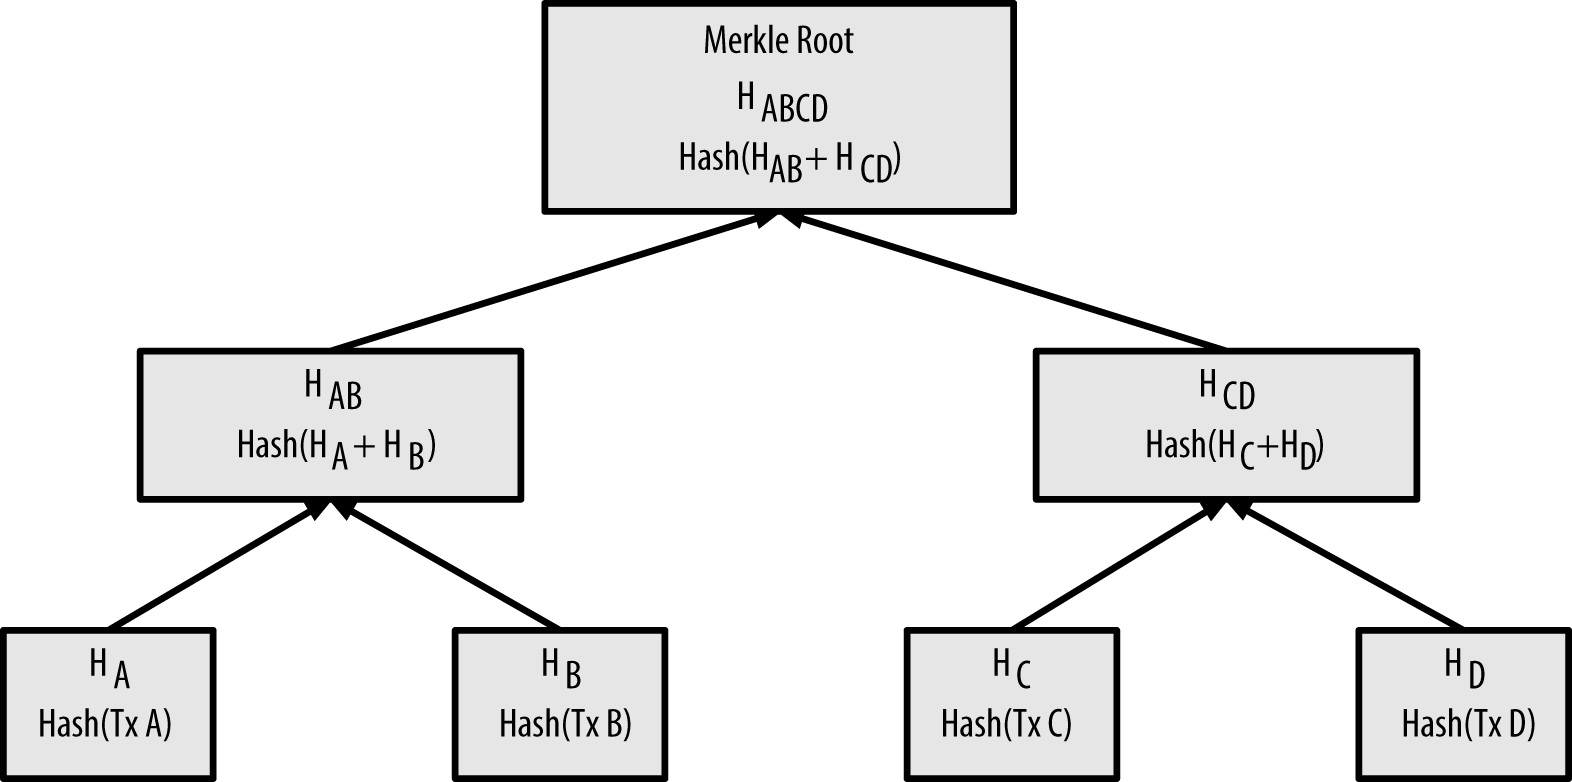 ELI5 What is a Merkle Root?